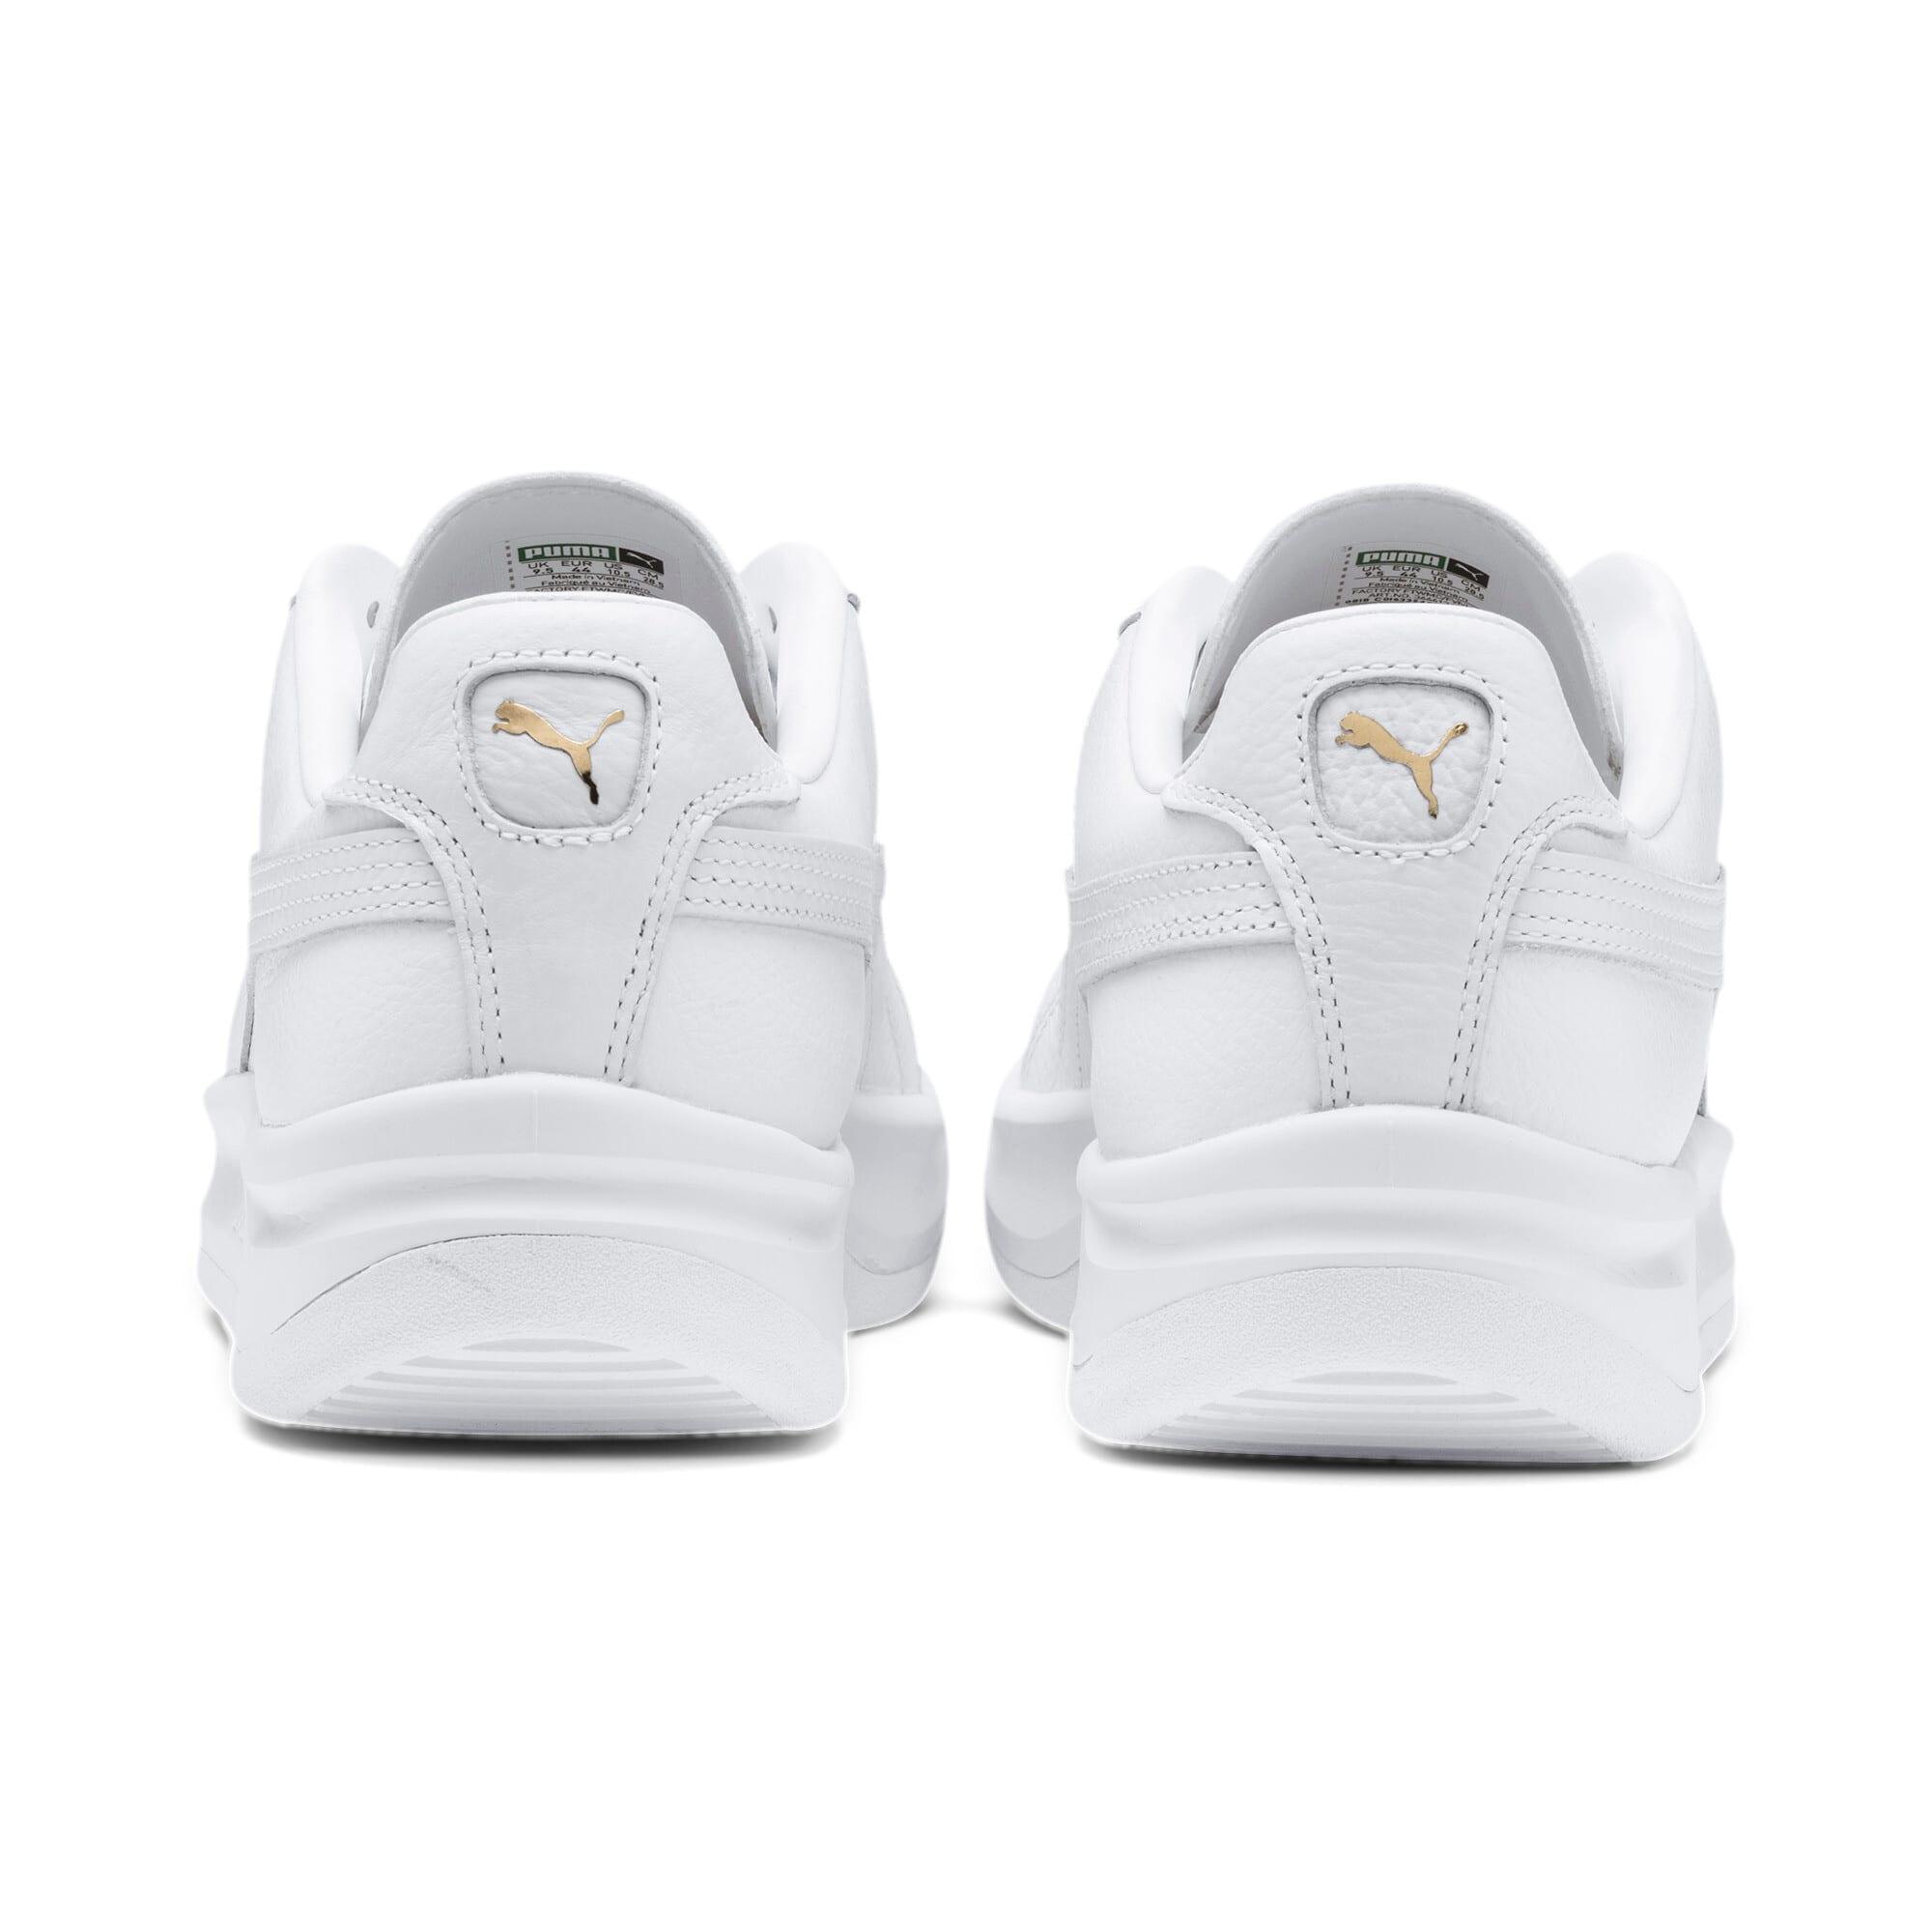 Thumbnail 3 of GV Special+ Sneakers, Puma White-Puma White, medium